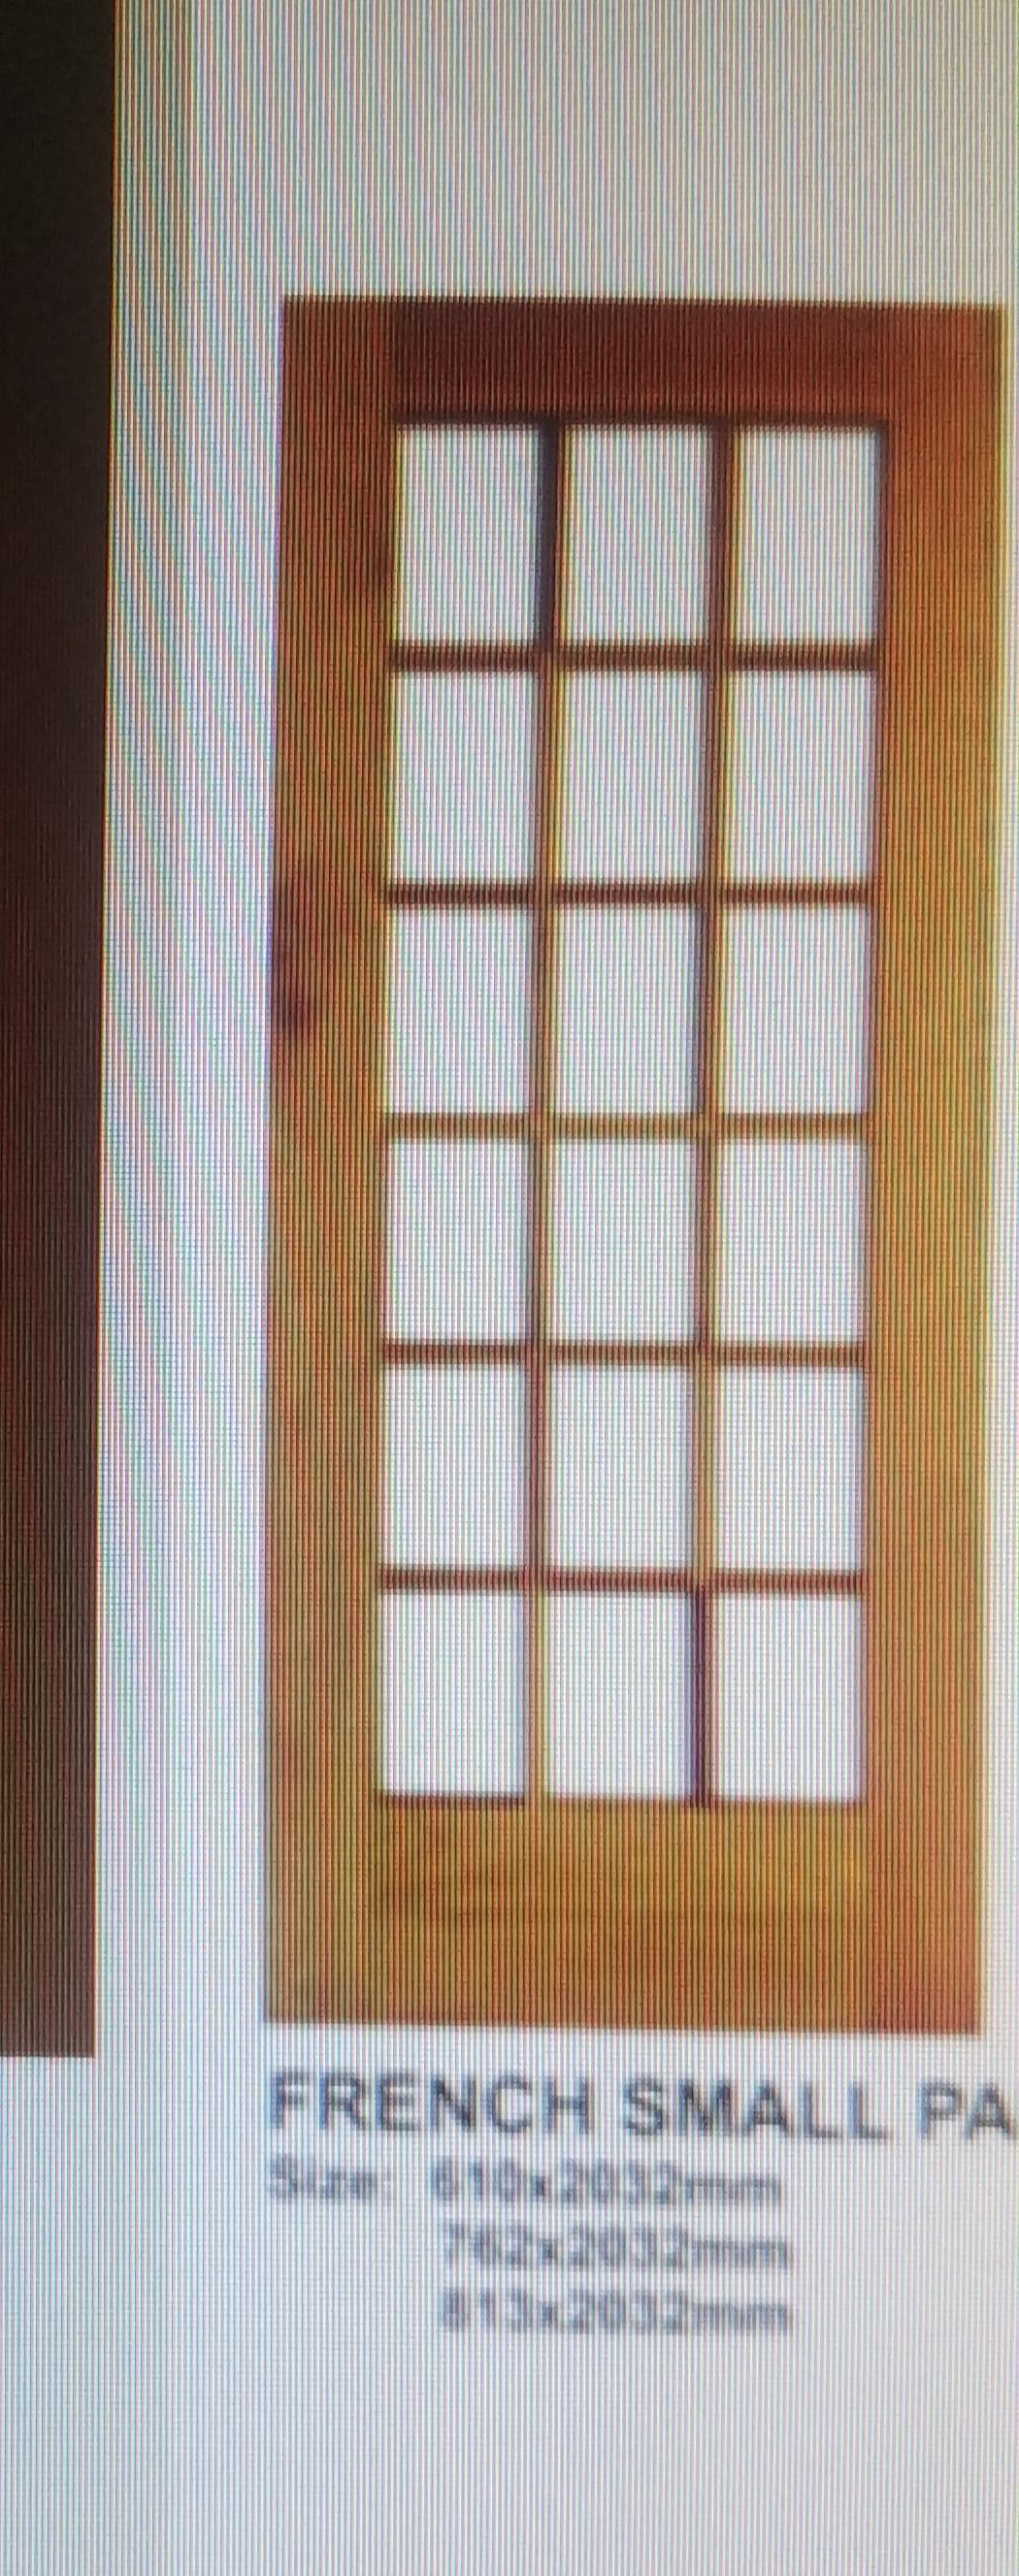 FRENCH MERANTI SINGLE PANEL DOOR FOR SALE URGENTLY